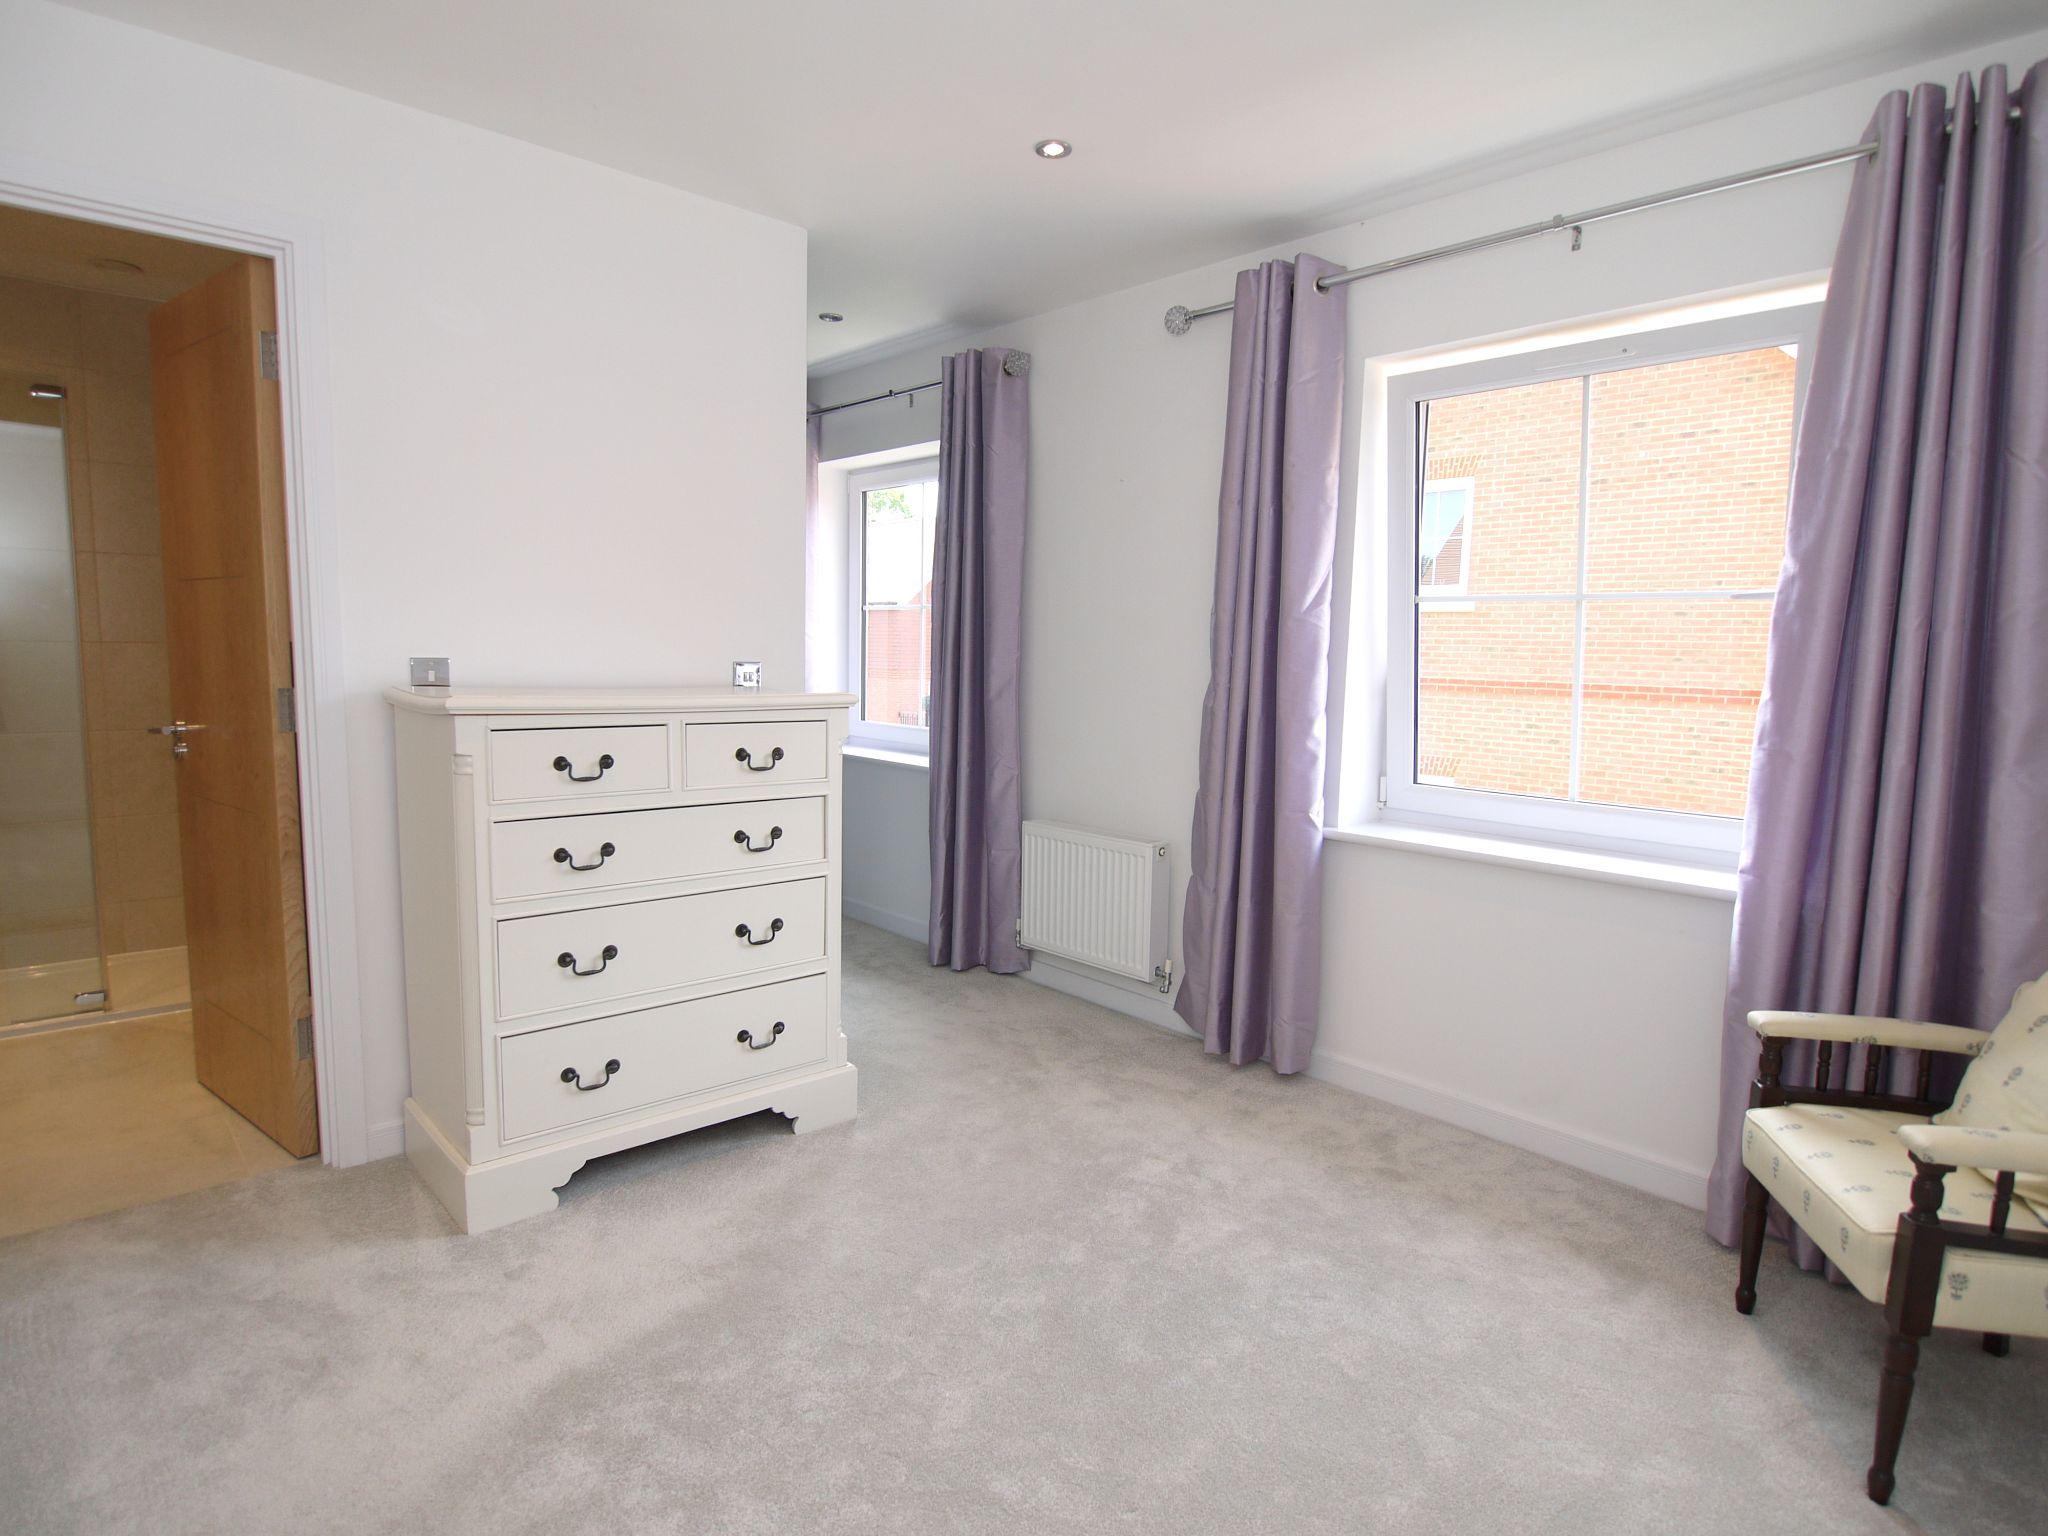 4 bedroom mid terraced house For Sale in Sevenoaks - Photograph 6